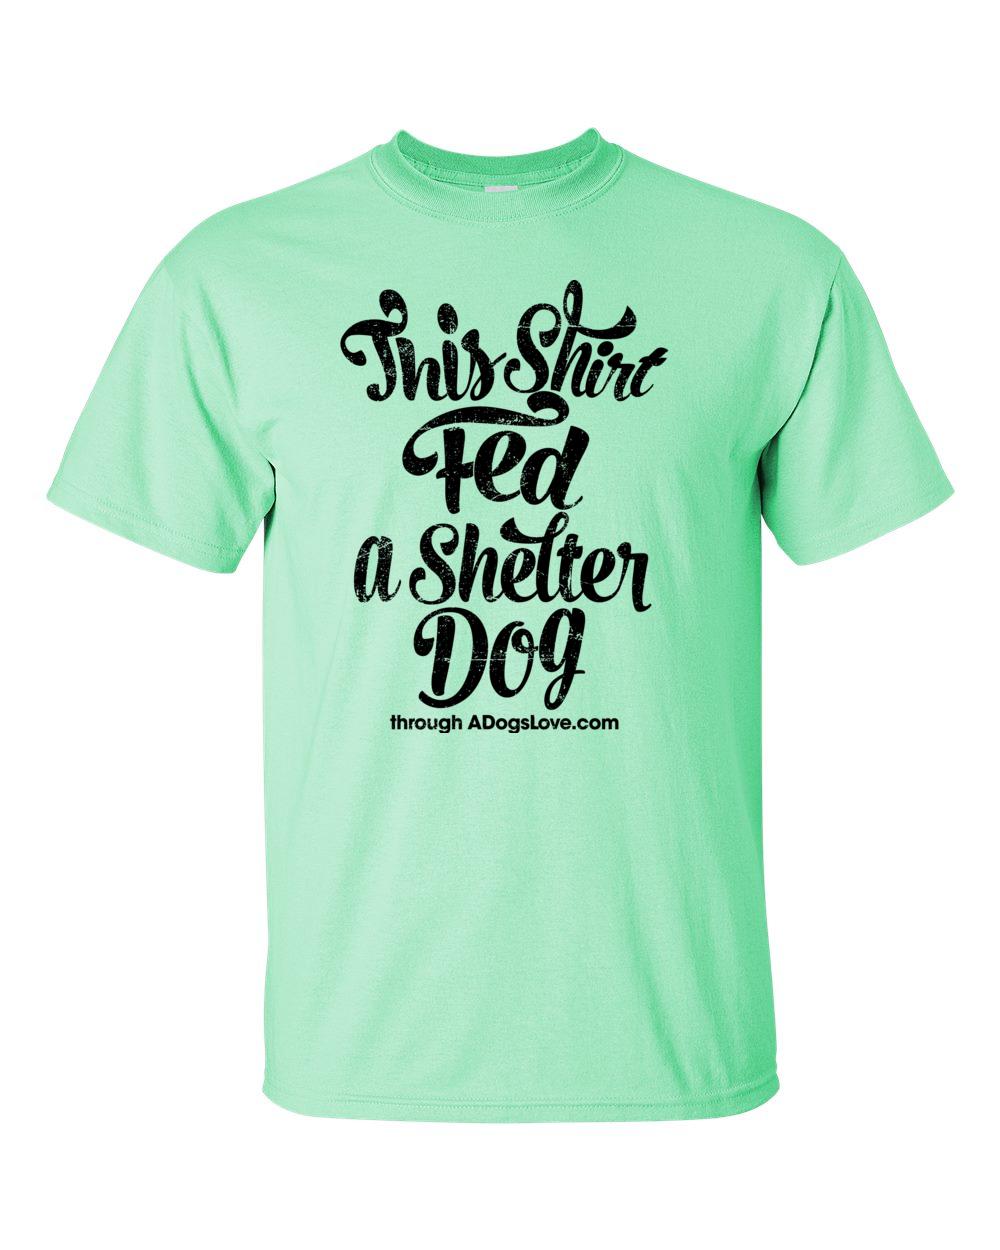 Fed A Shelter Dog Tee Shelter Dogs Animal Shelter Shirt Animal Shelter Fundraiser